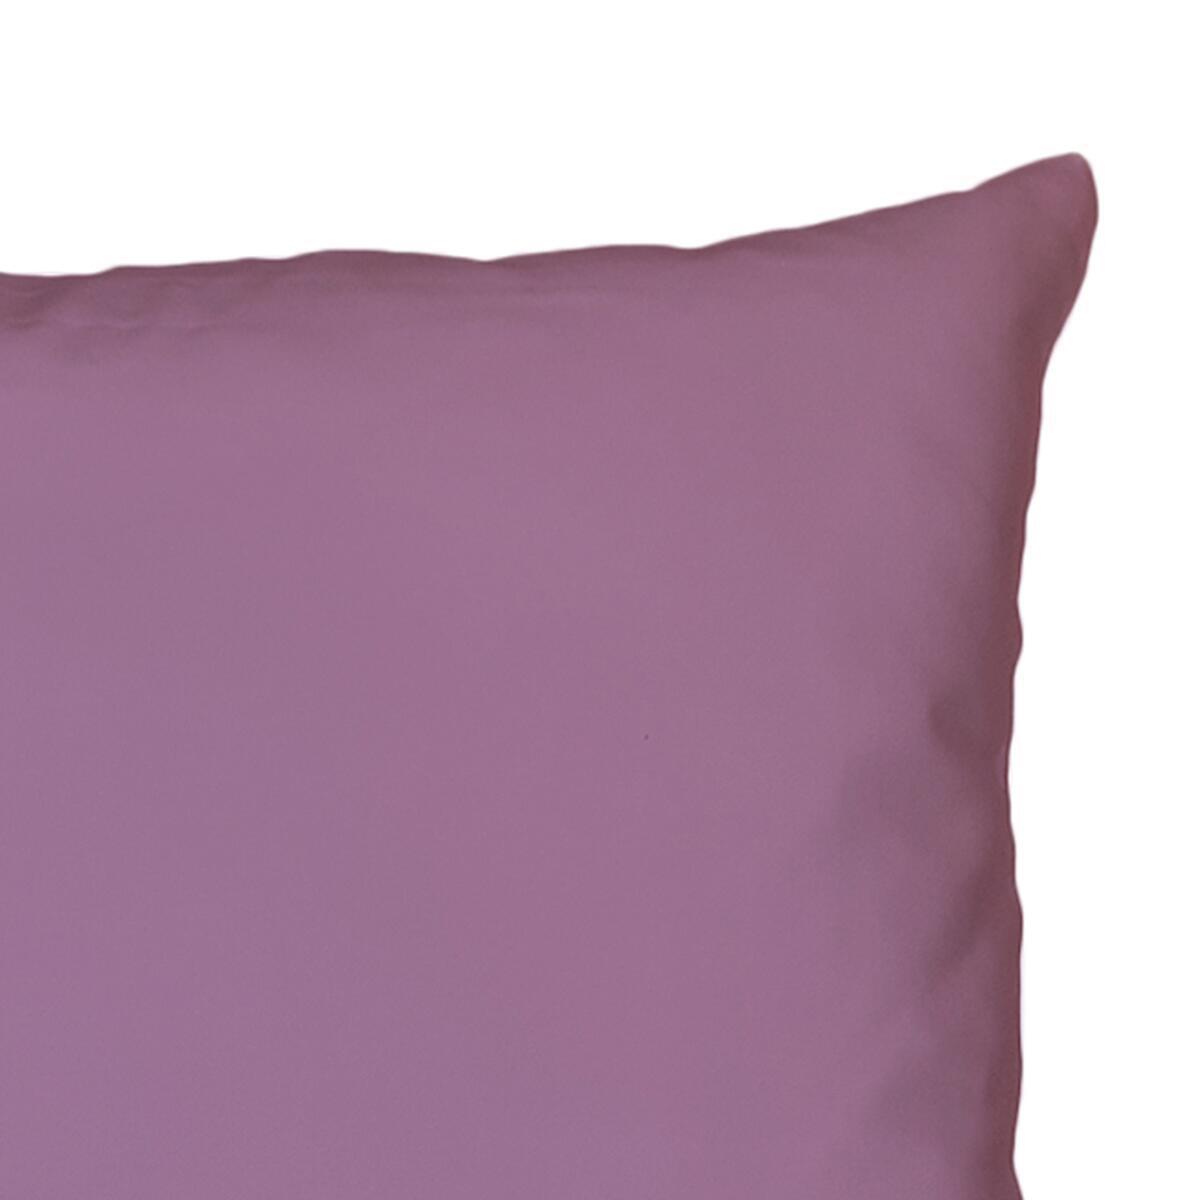 Cuscino Loneta lilla 70x70 cm - 2